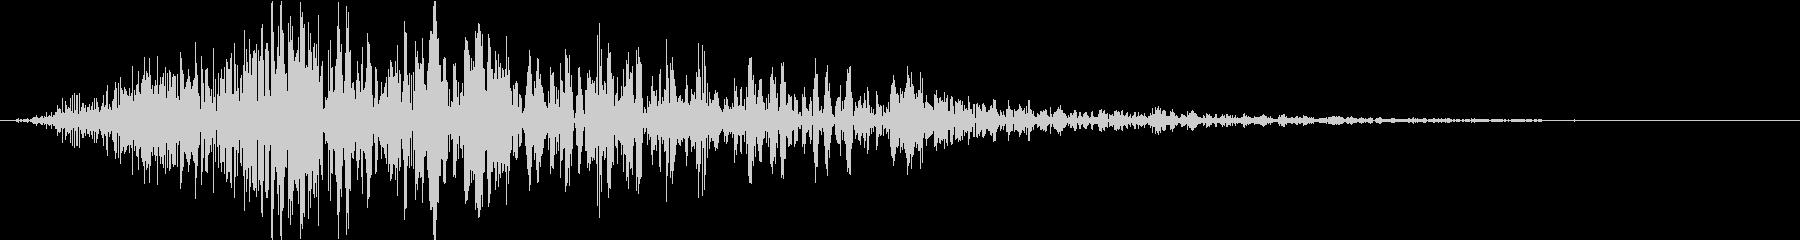 Shout HA !! _short's unreproduced waveform